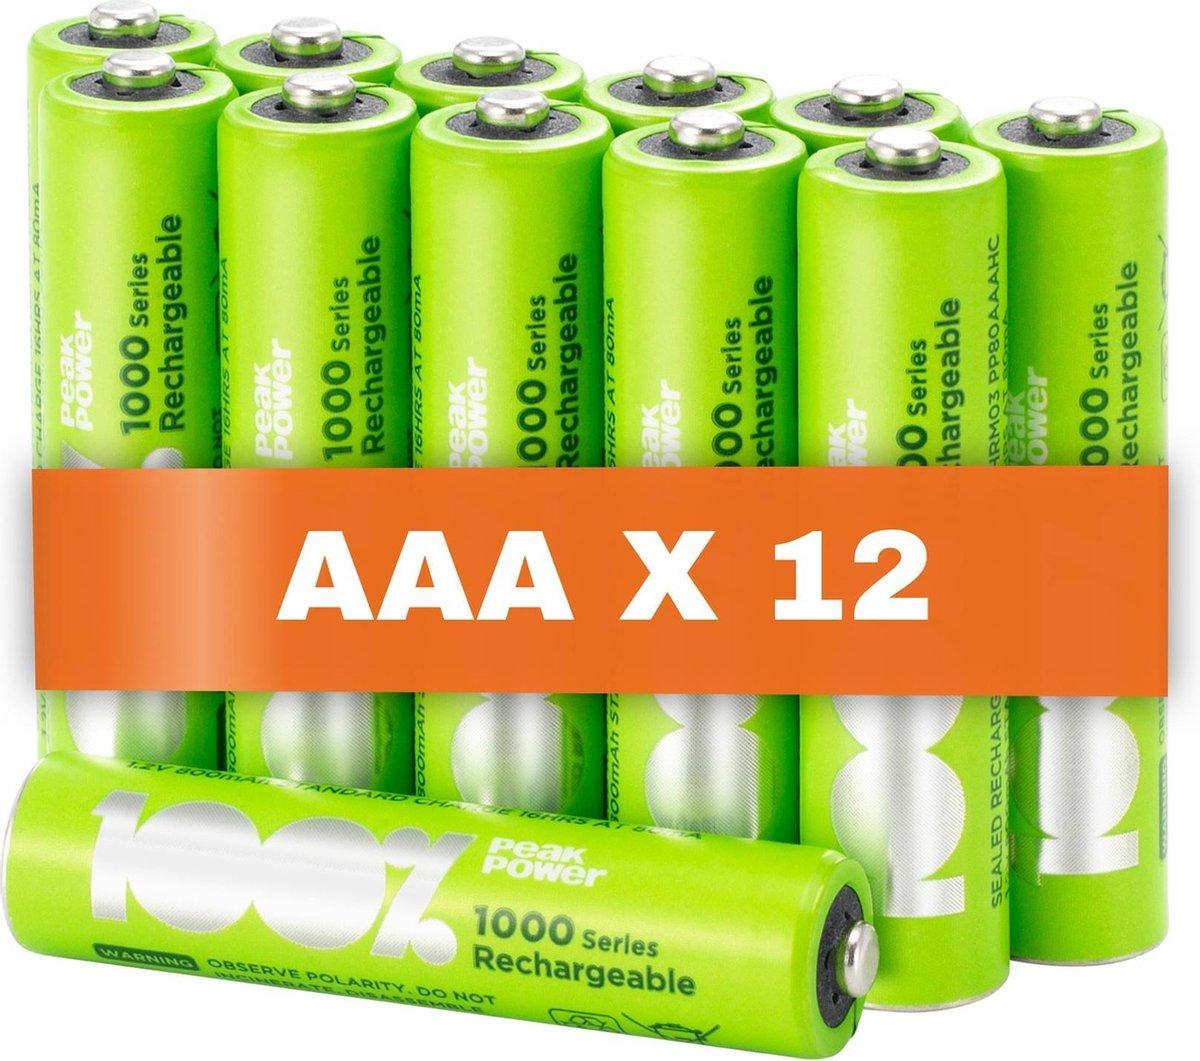 100% Peak Power oplaadbare batterijen AAA - Duurzame Keuze - NiMH AAA batterij micro 800 mAh - 12 st